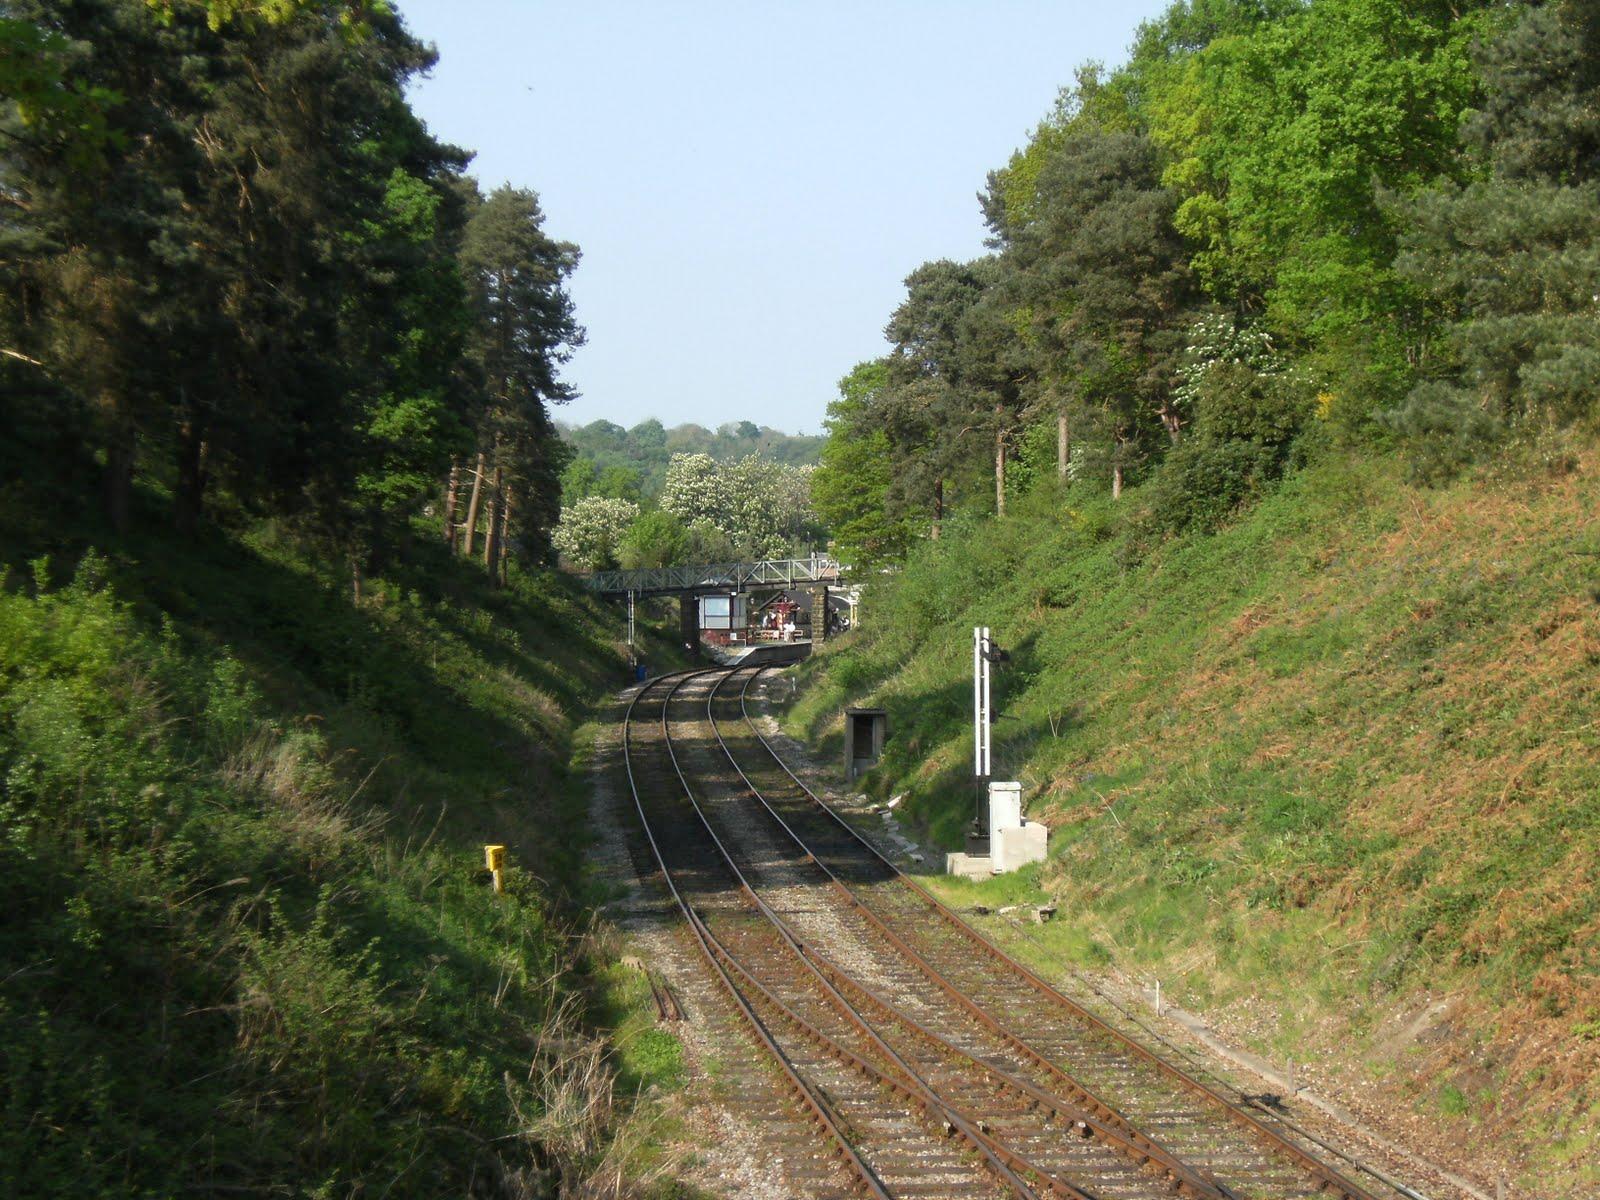 DSCF7493 Groombridge Station